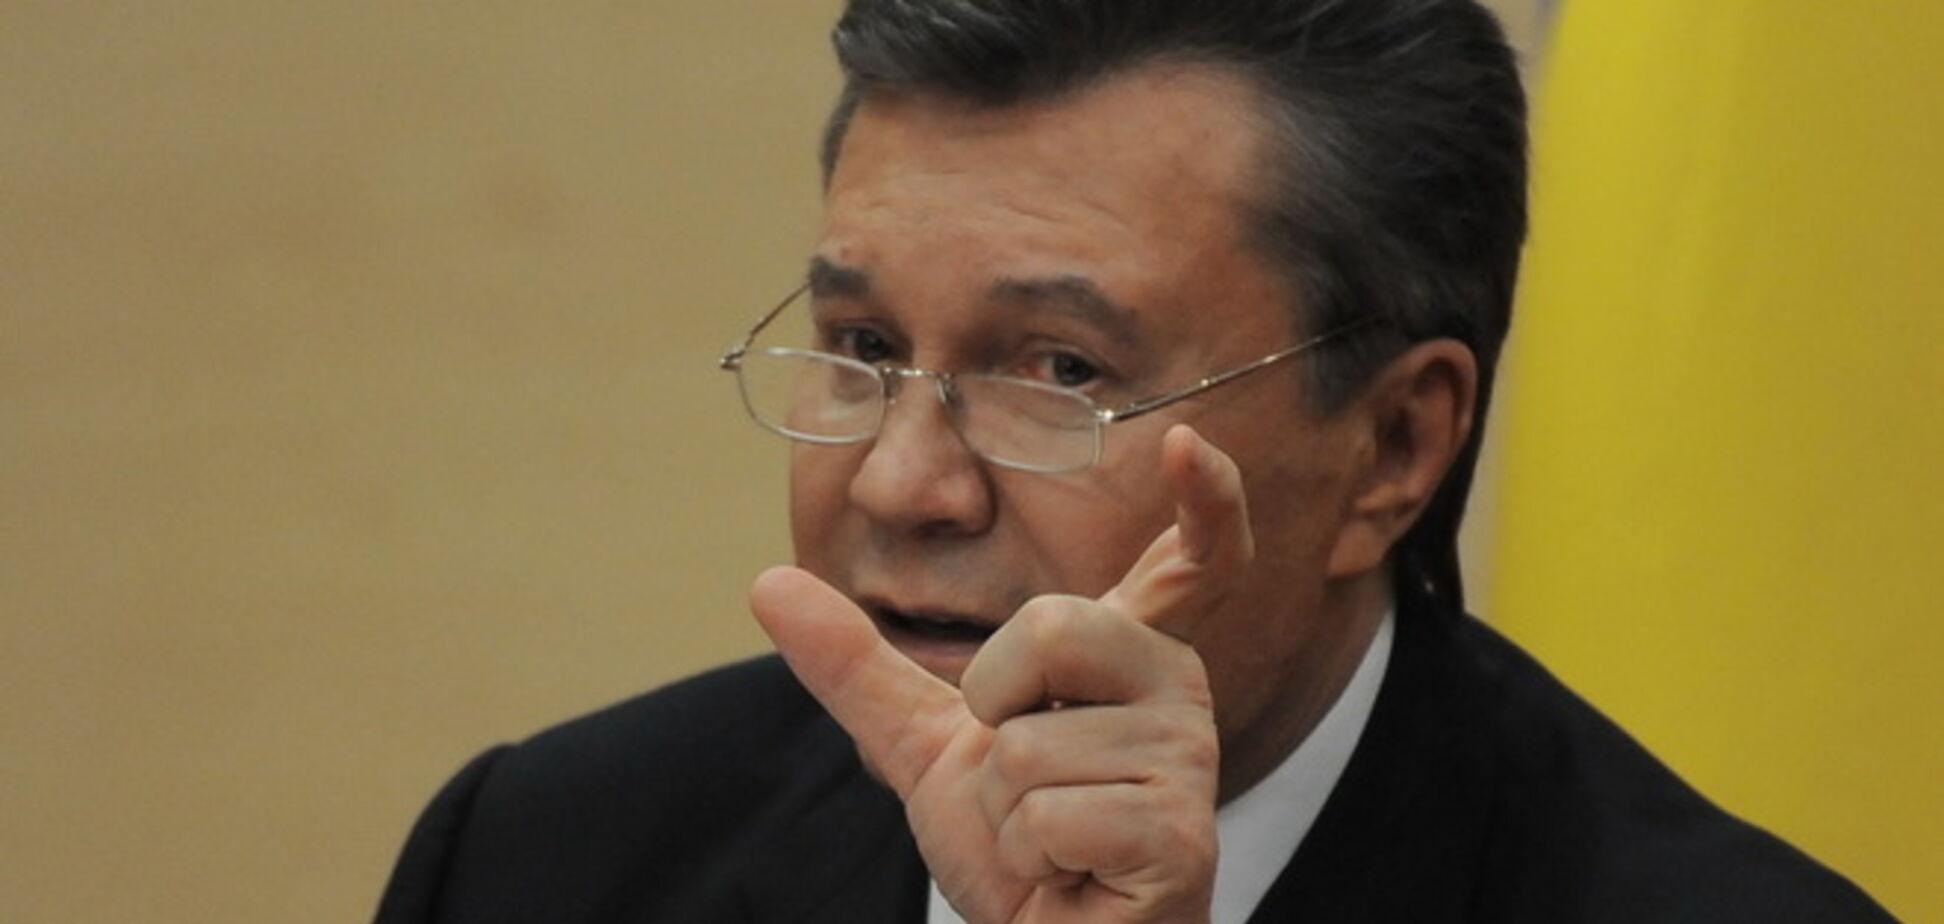 В Украине арестовали все имущество семьи Януковича - ГПУ